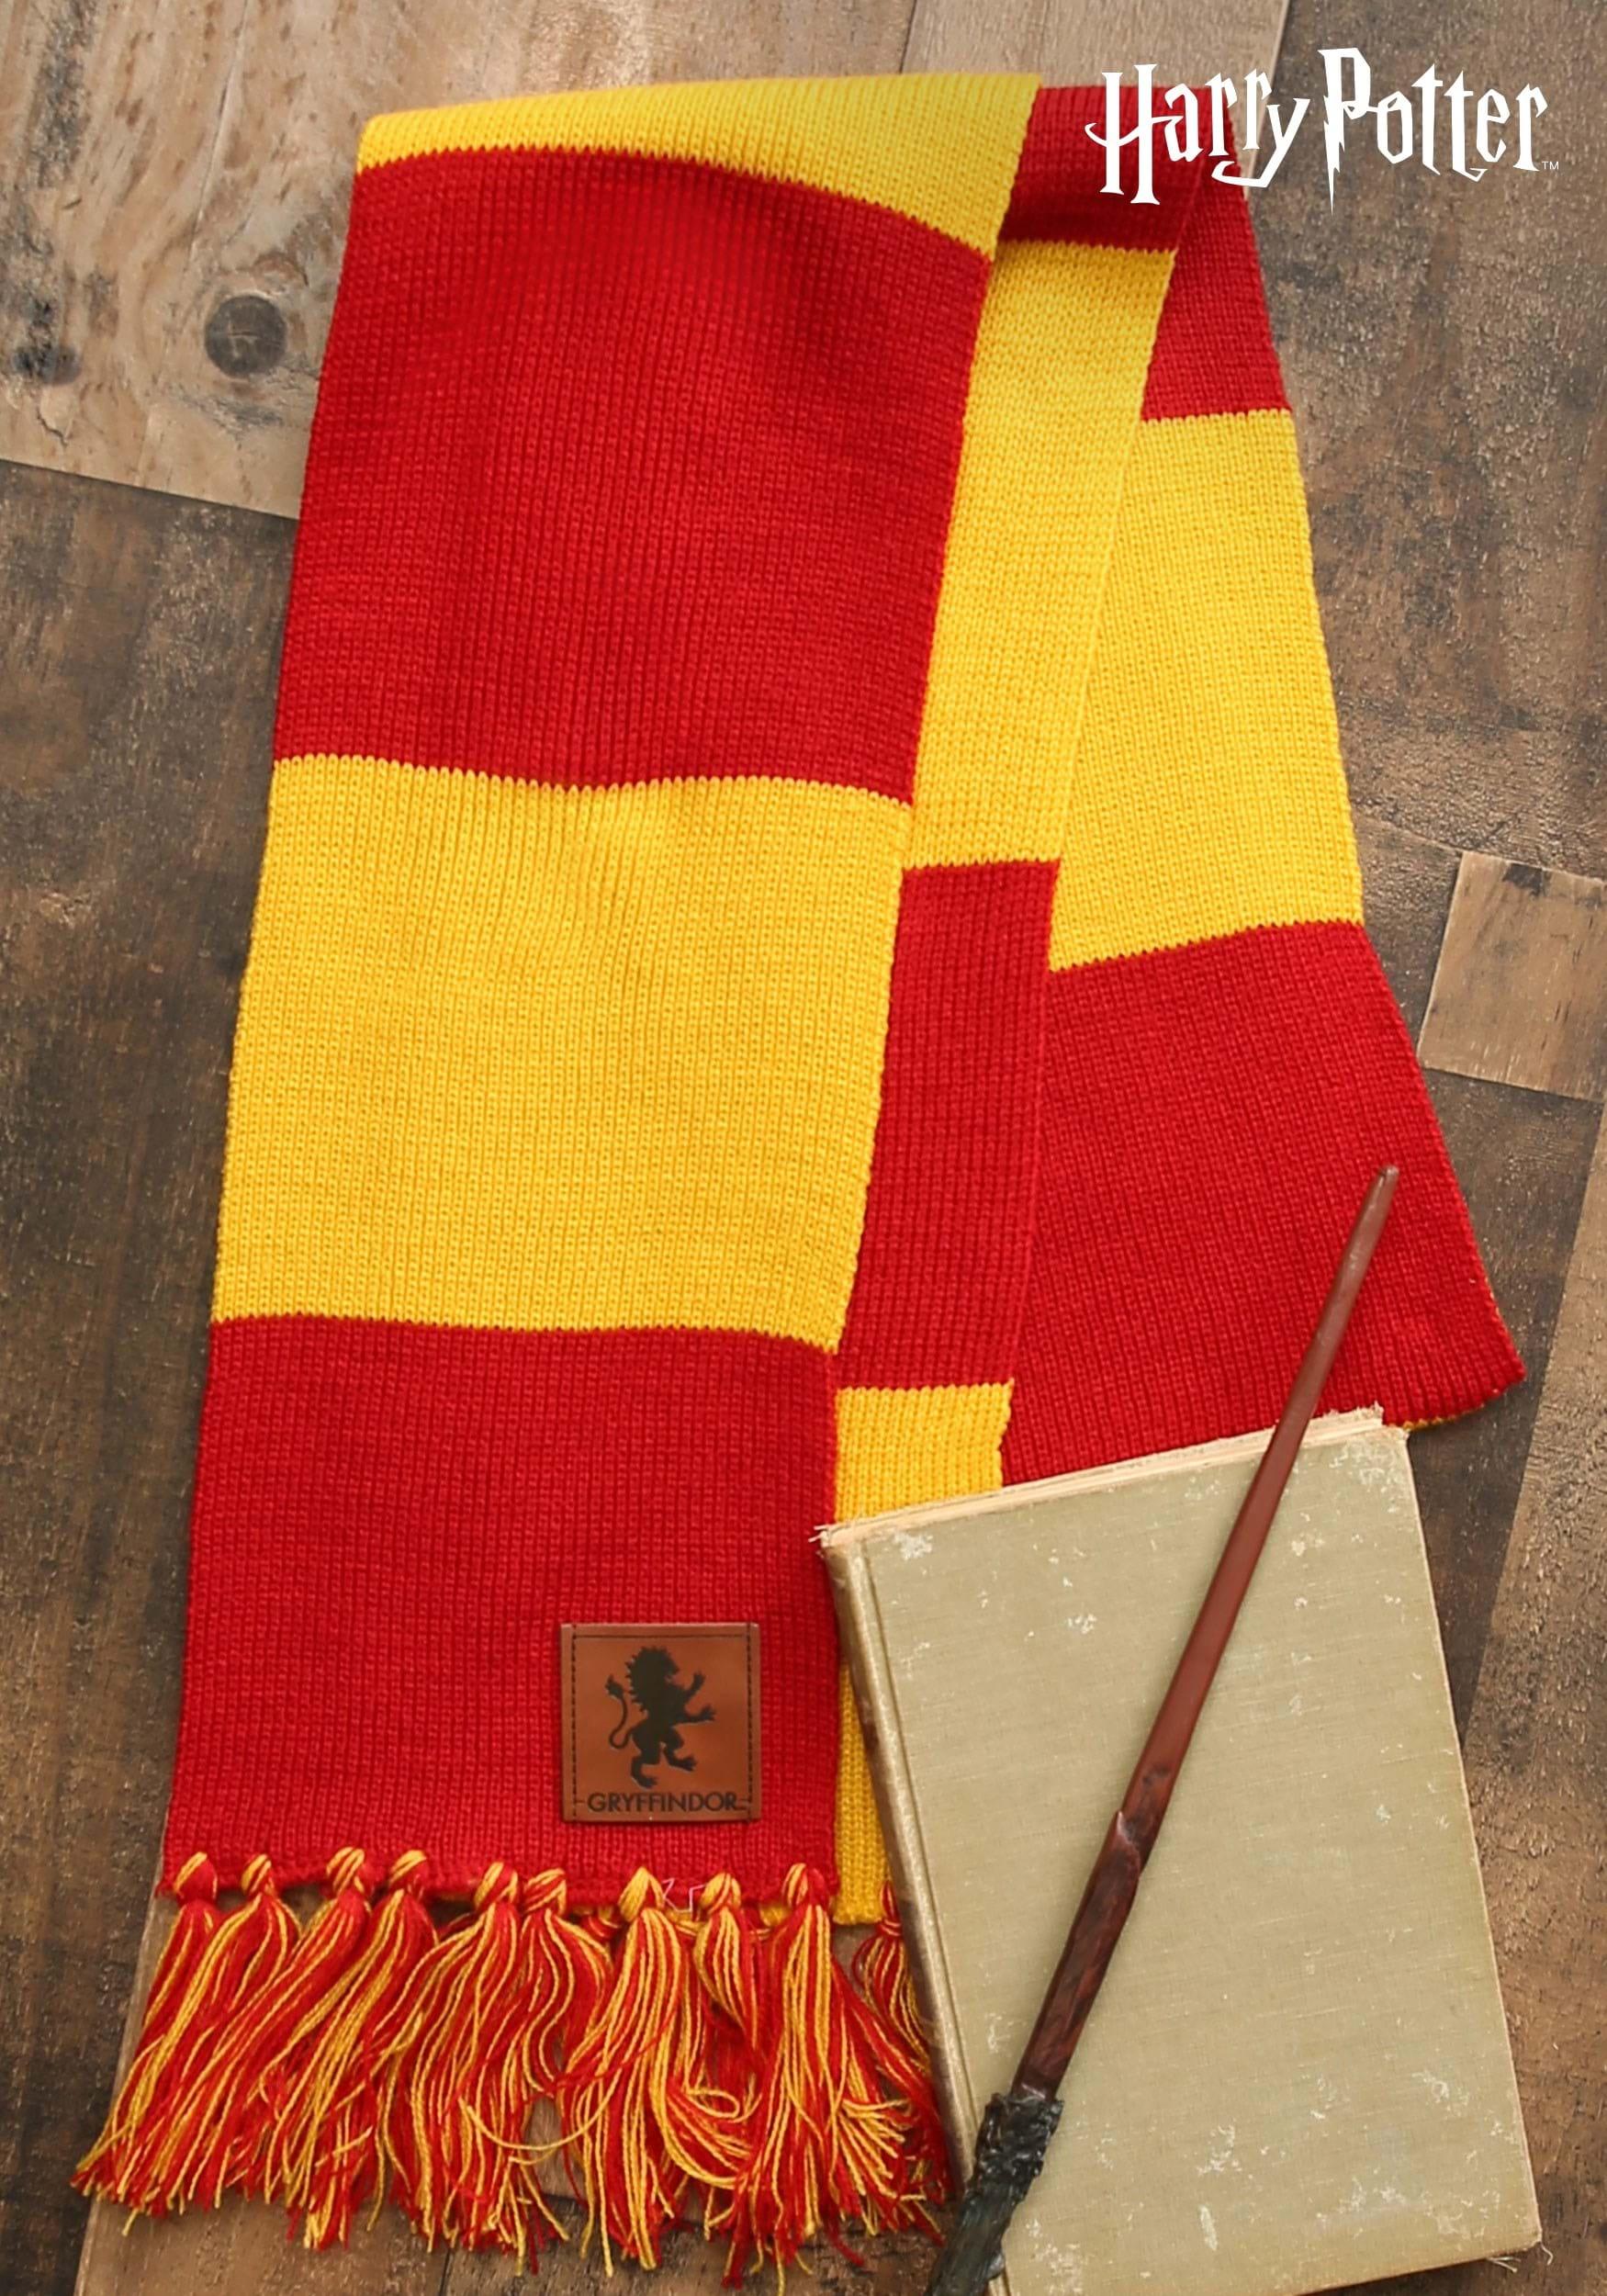 15e87da6d04 Harry Potter Gryffindor House Patch Striped Scarf